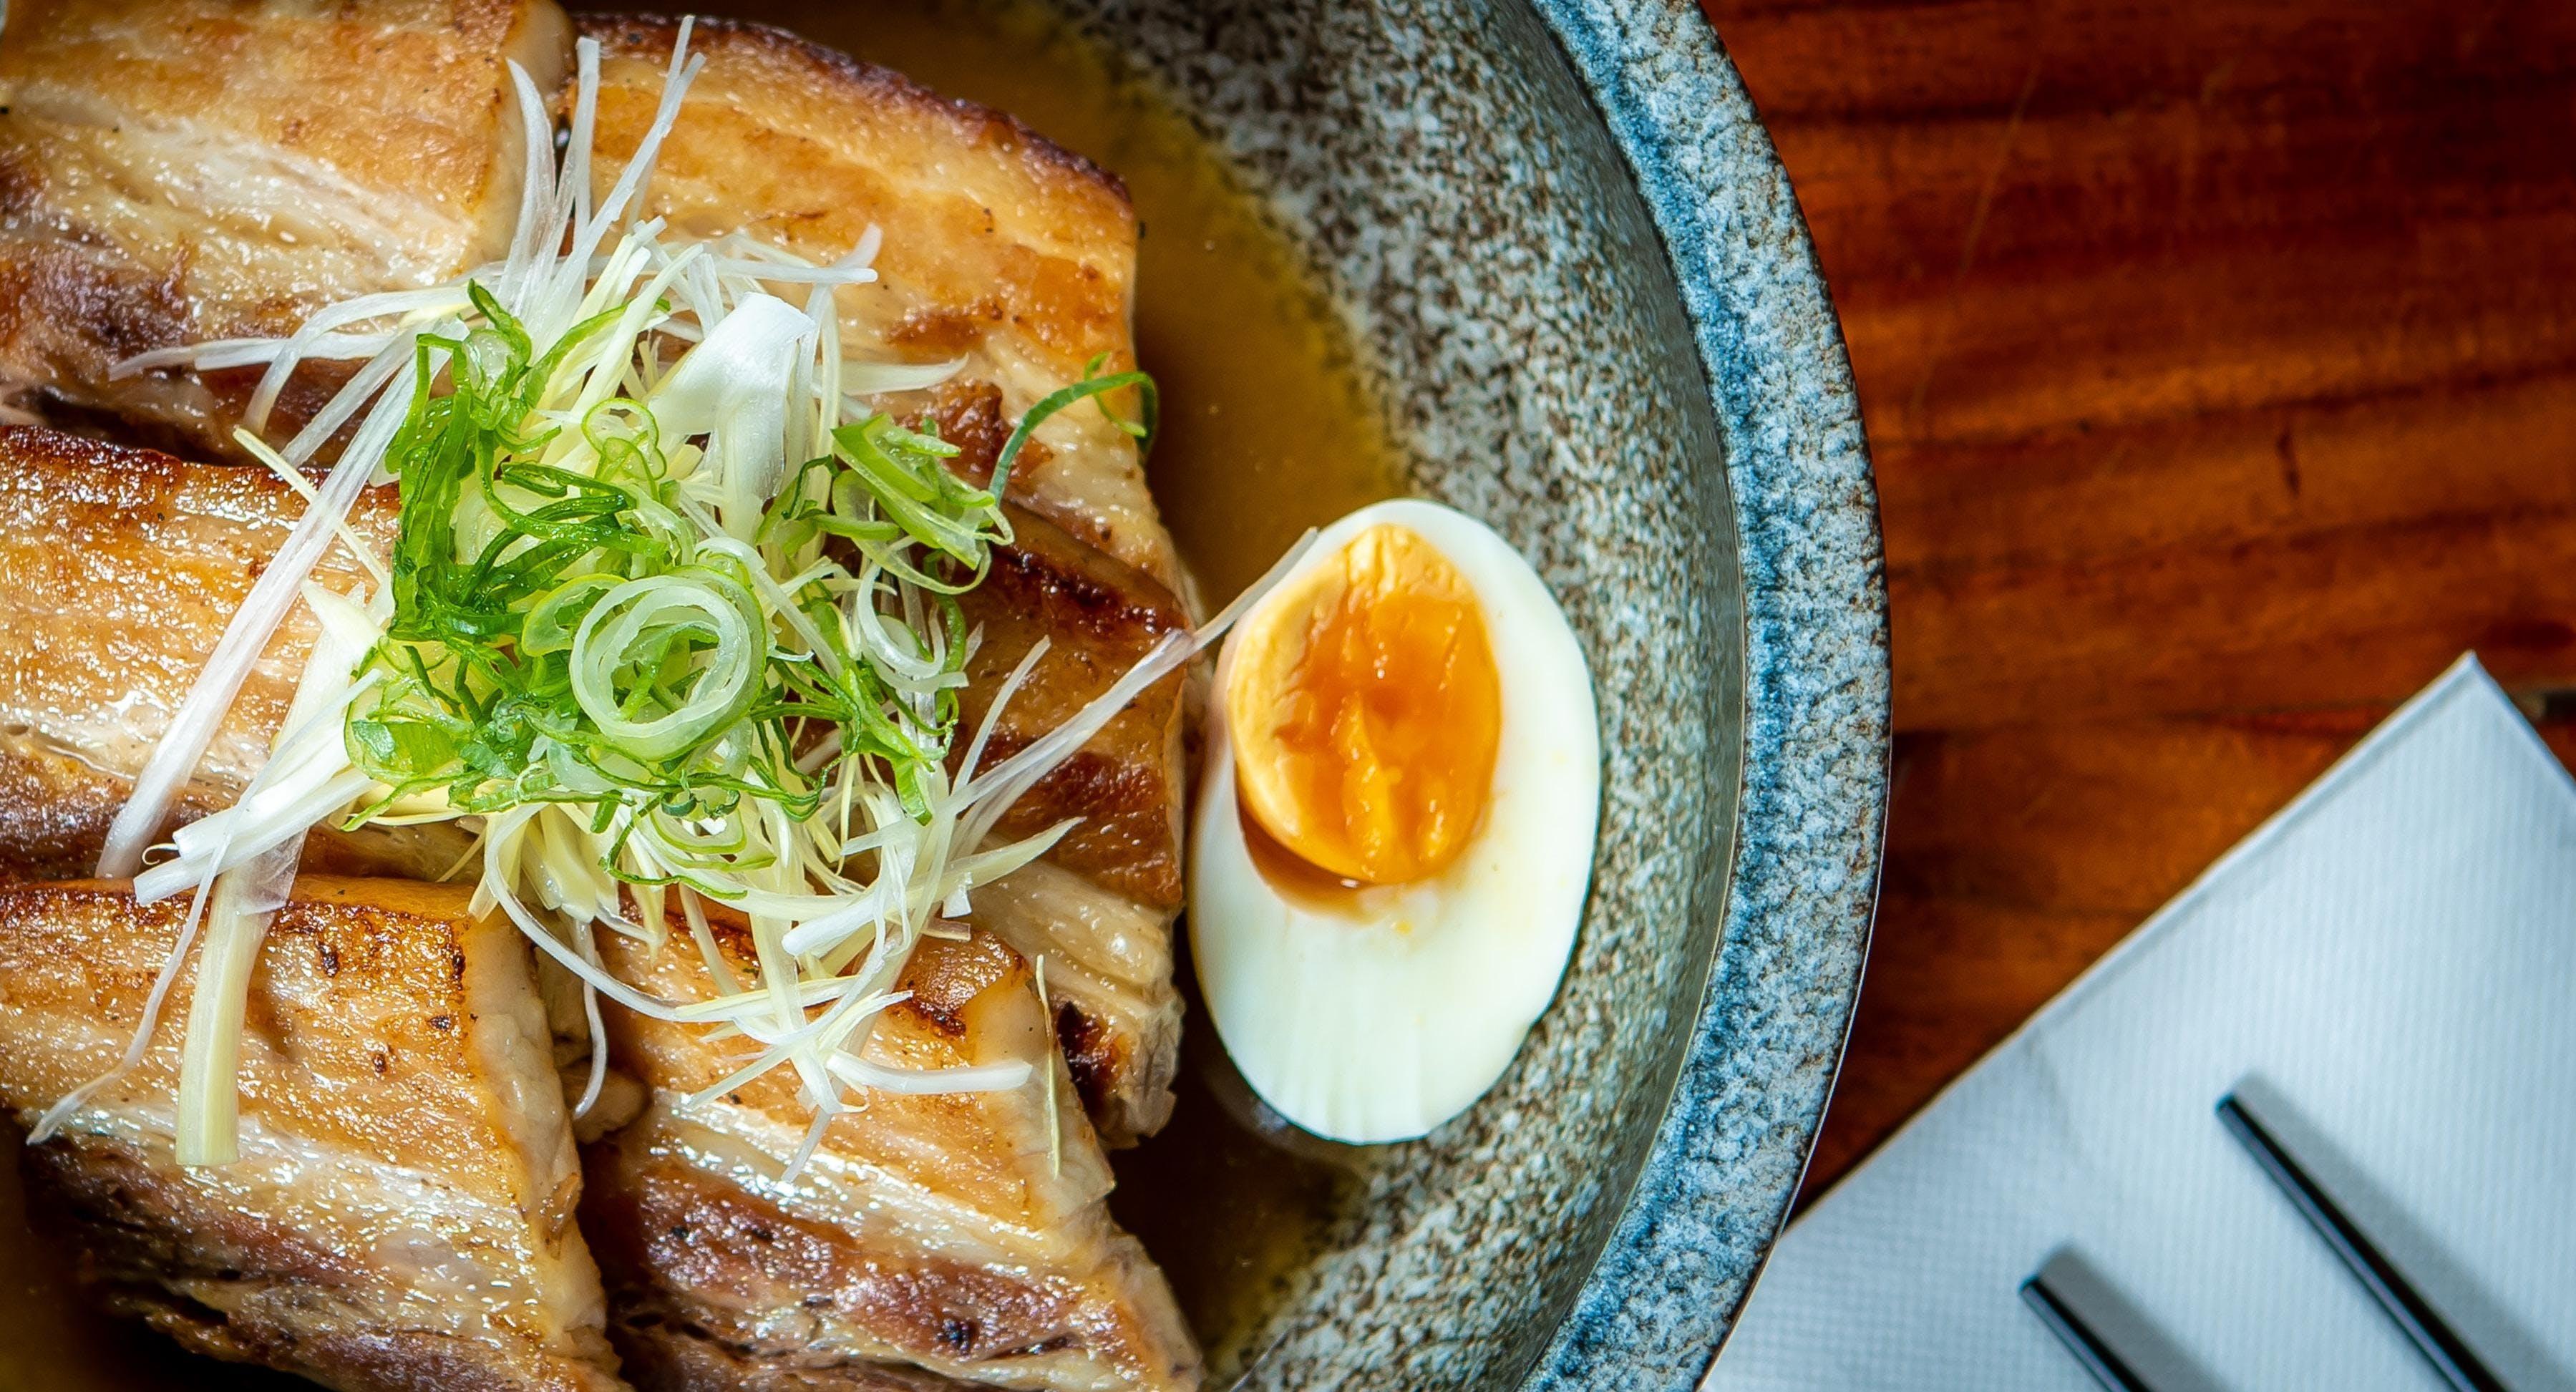 Ichika-Sushi & Asian Cuisine Melbourne image 3